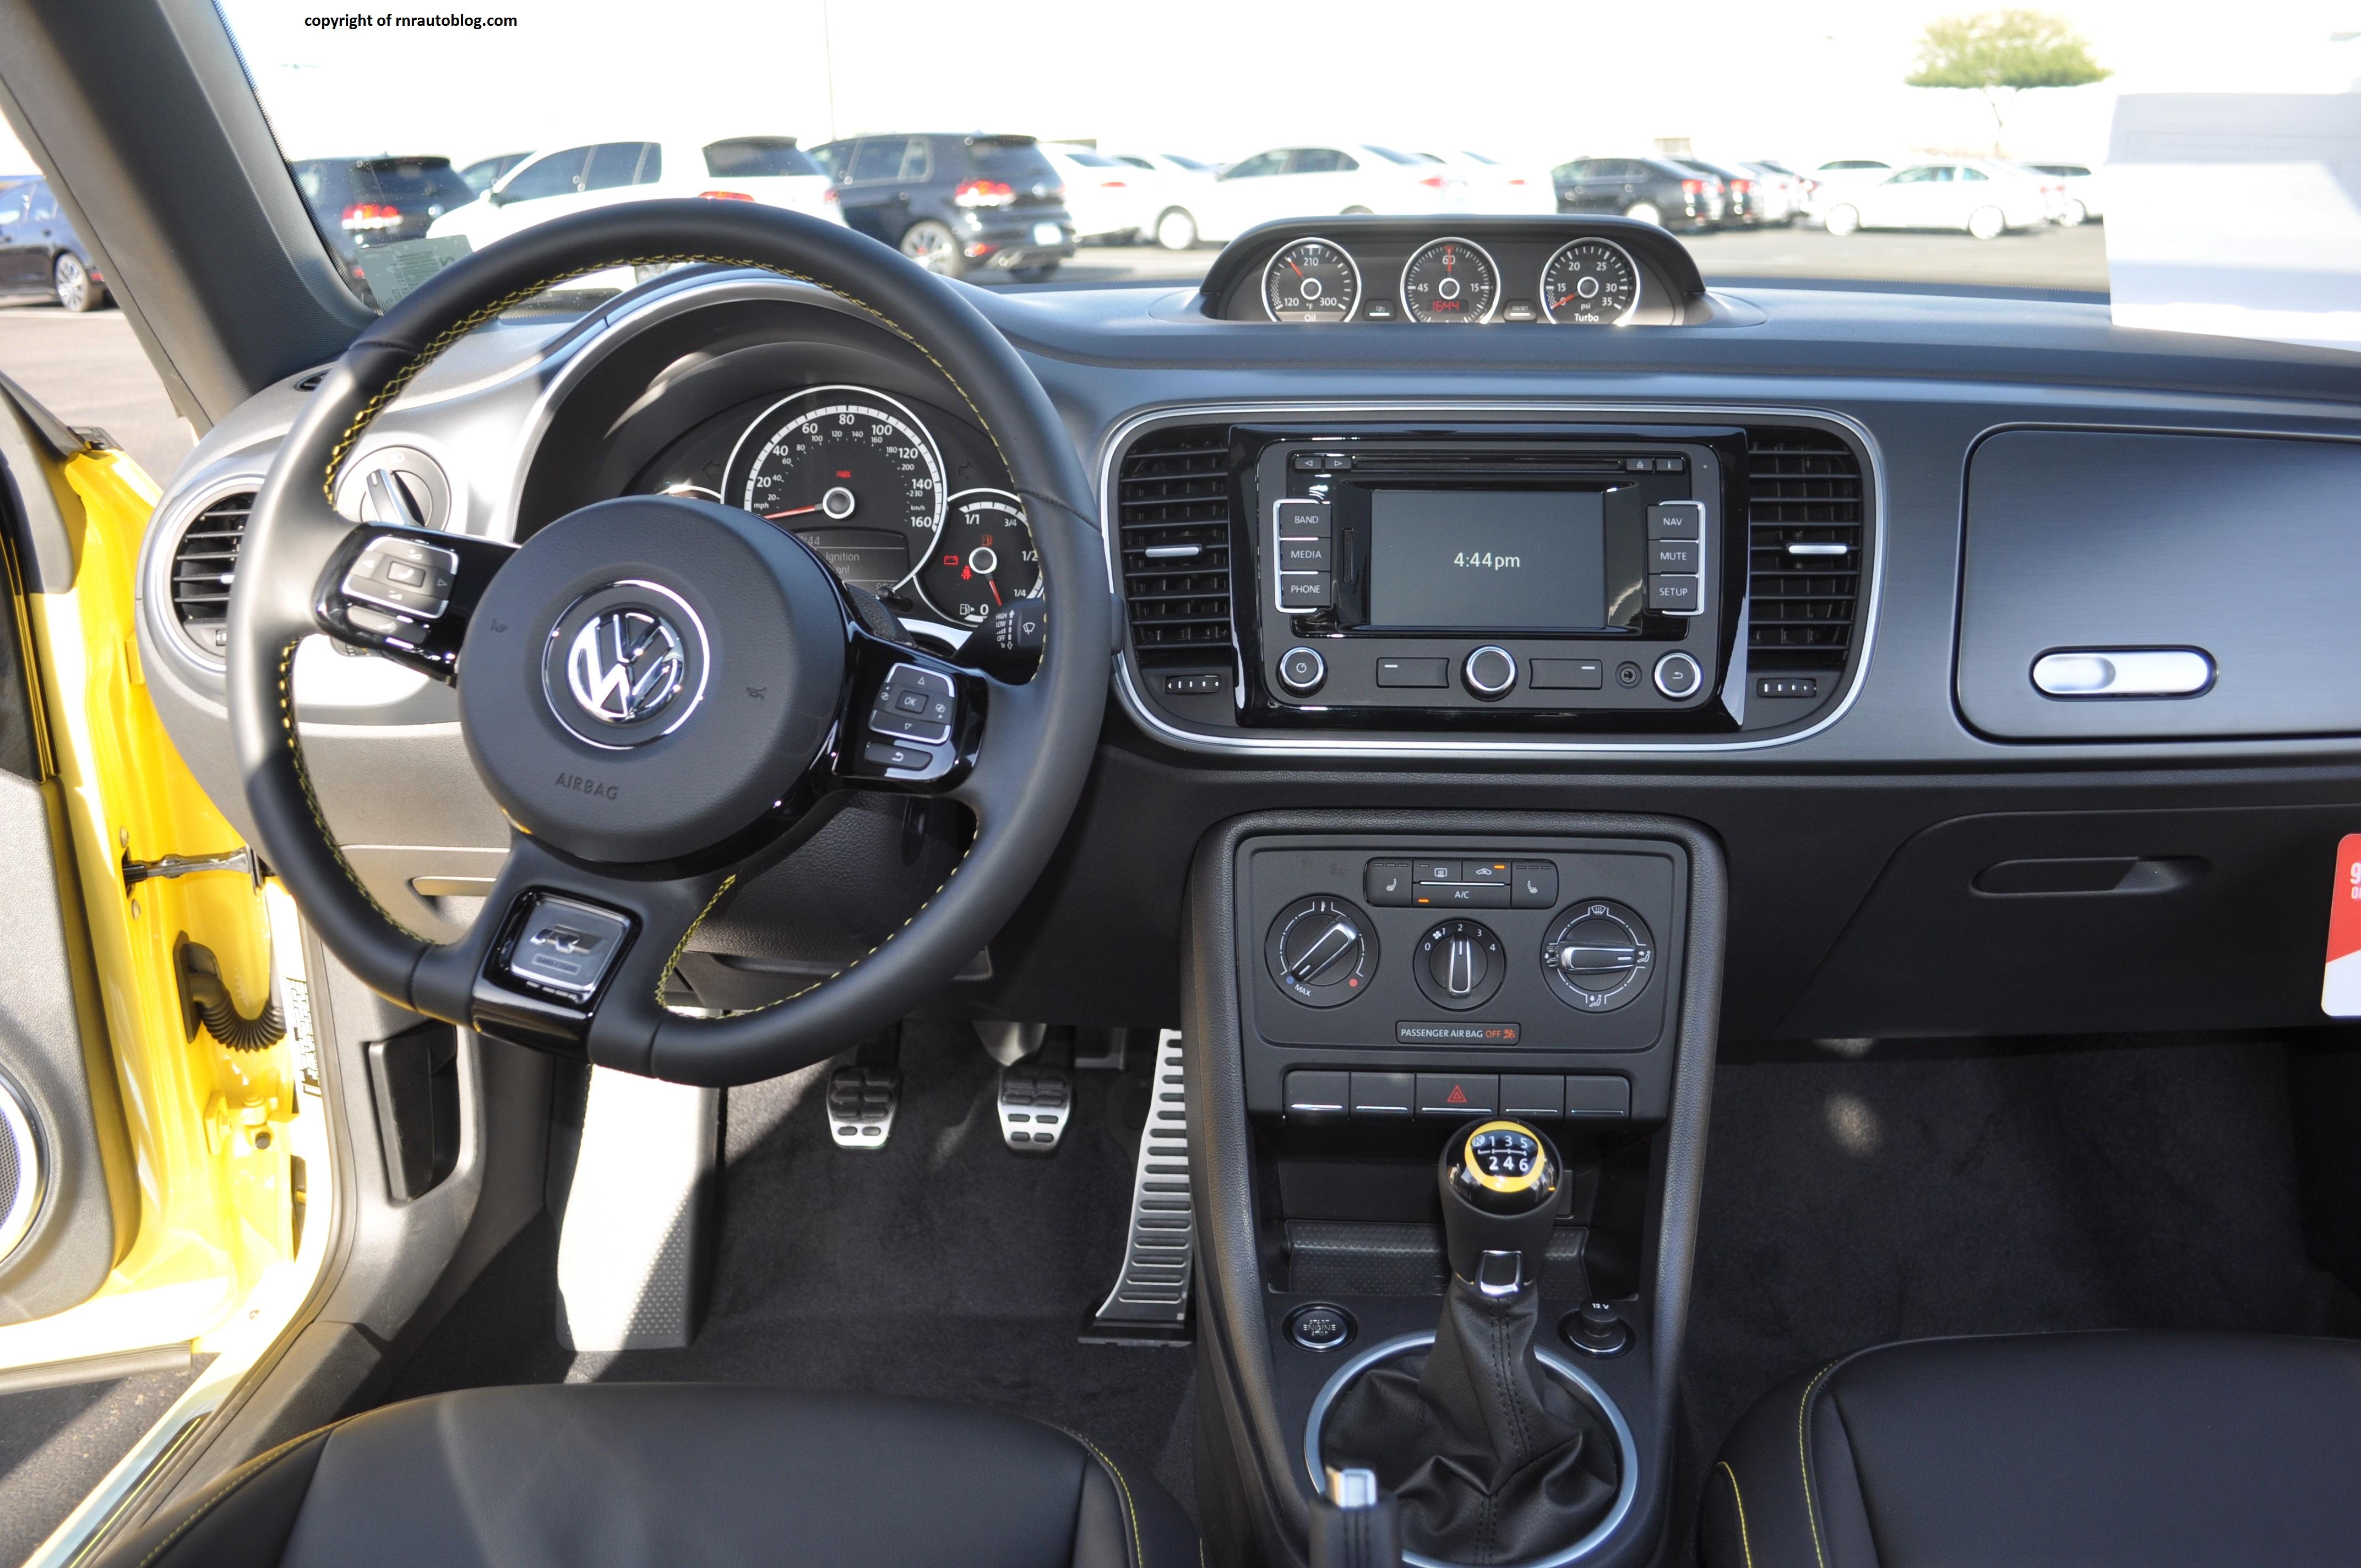 2014 Volkswagen Beetle Gsr Turbo Review Rnr Automotive Blog